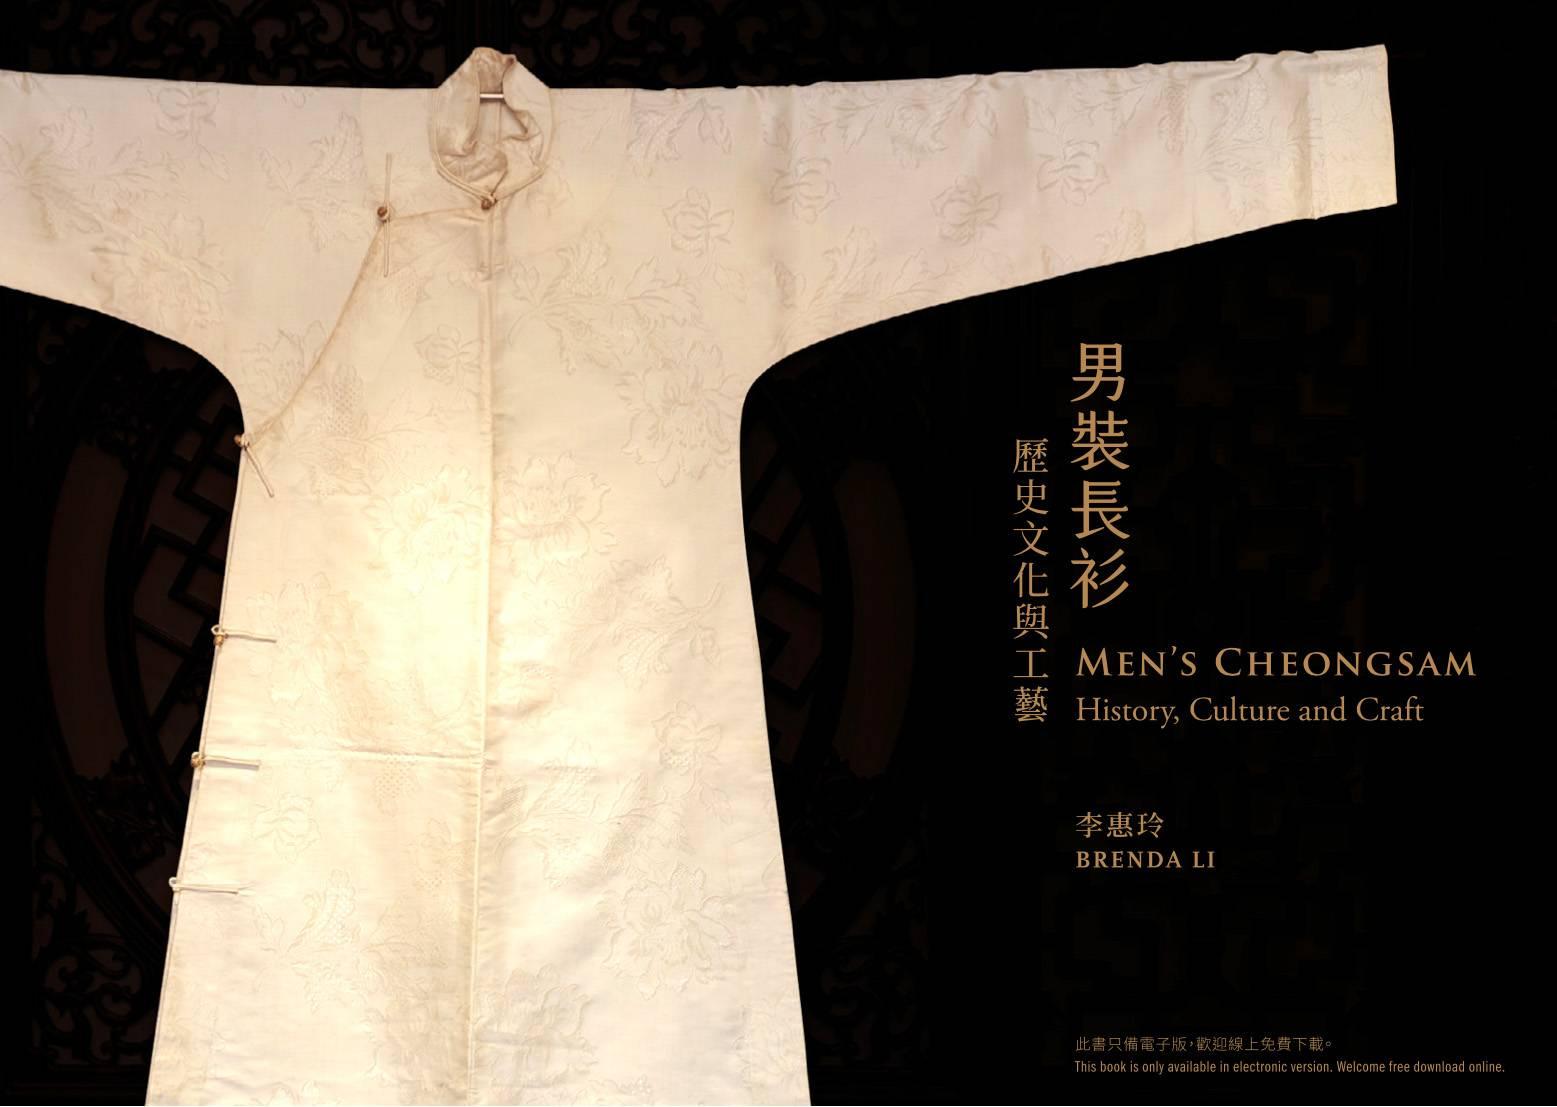 《男裝長衫:歷史文化與工藝》Men's Cheongsam: History, Culture and Craft